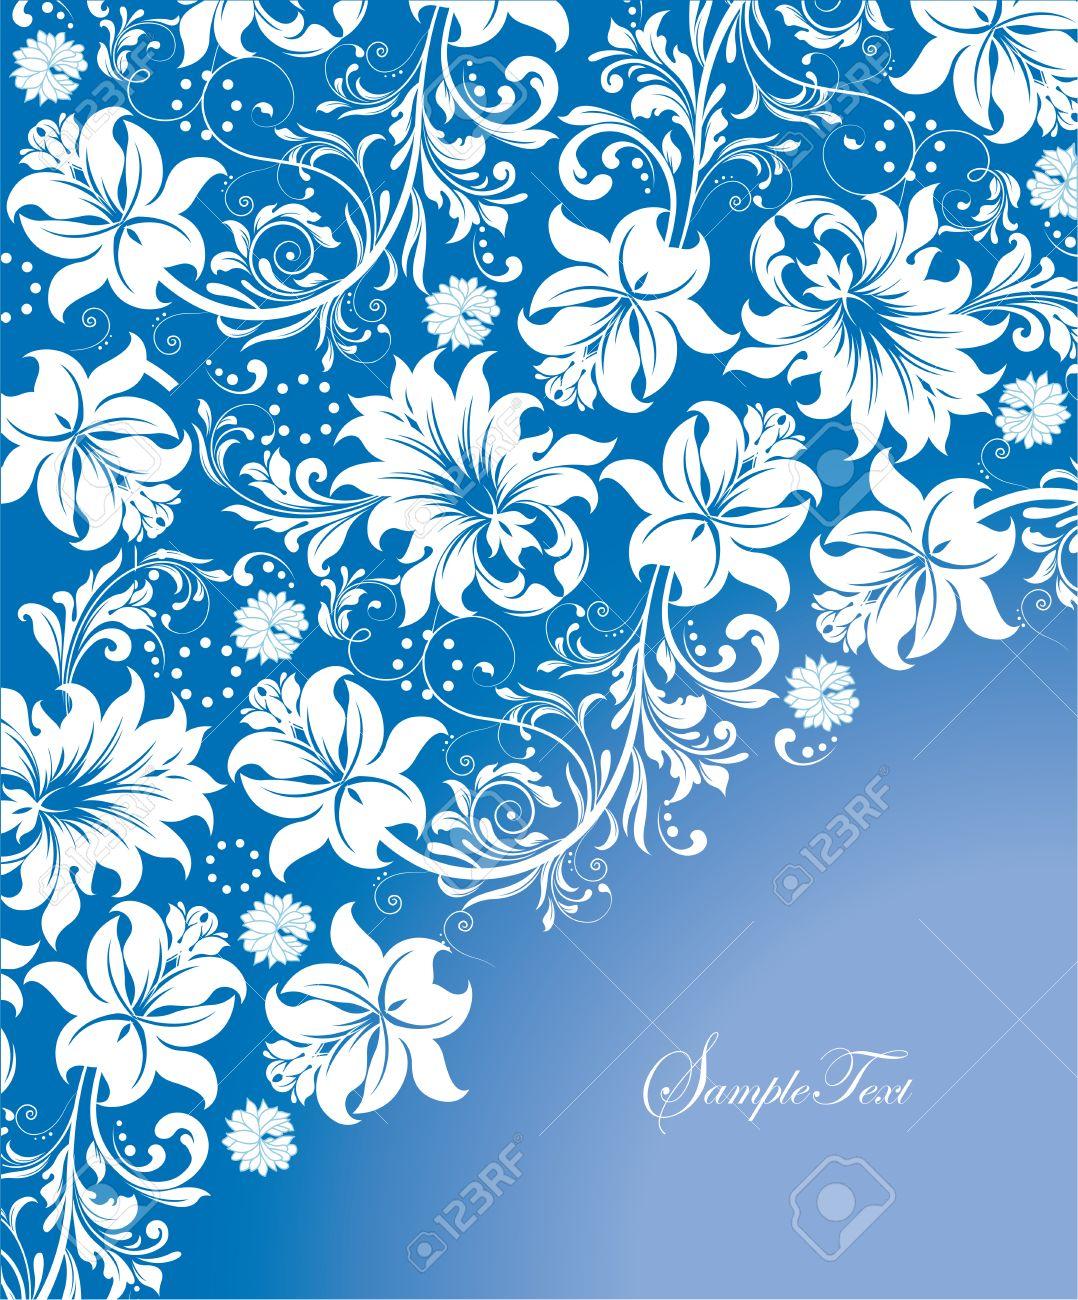 vintage invitation card with ornate elegant abstract floral design